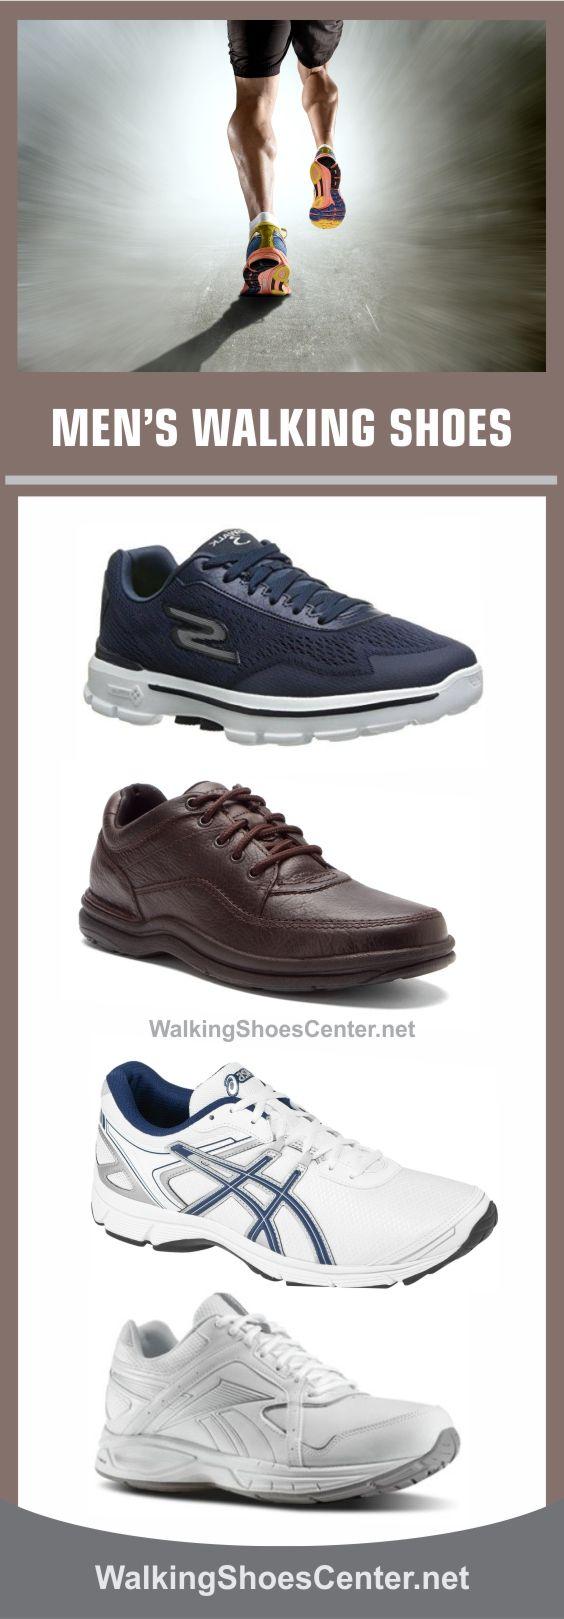 comforter europe disneyland disney walking good shoe for comfortable most world around shoes